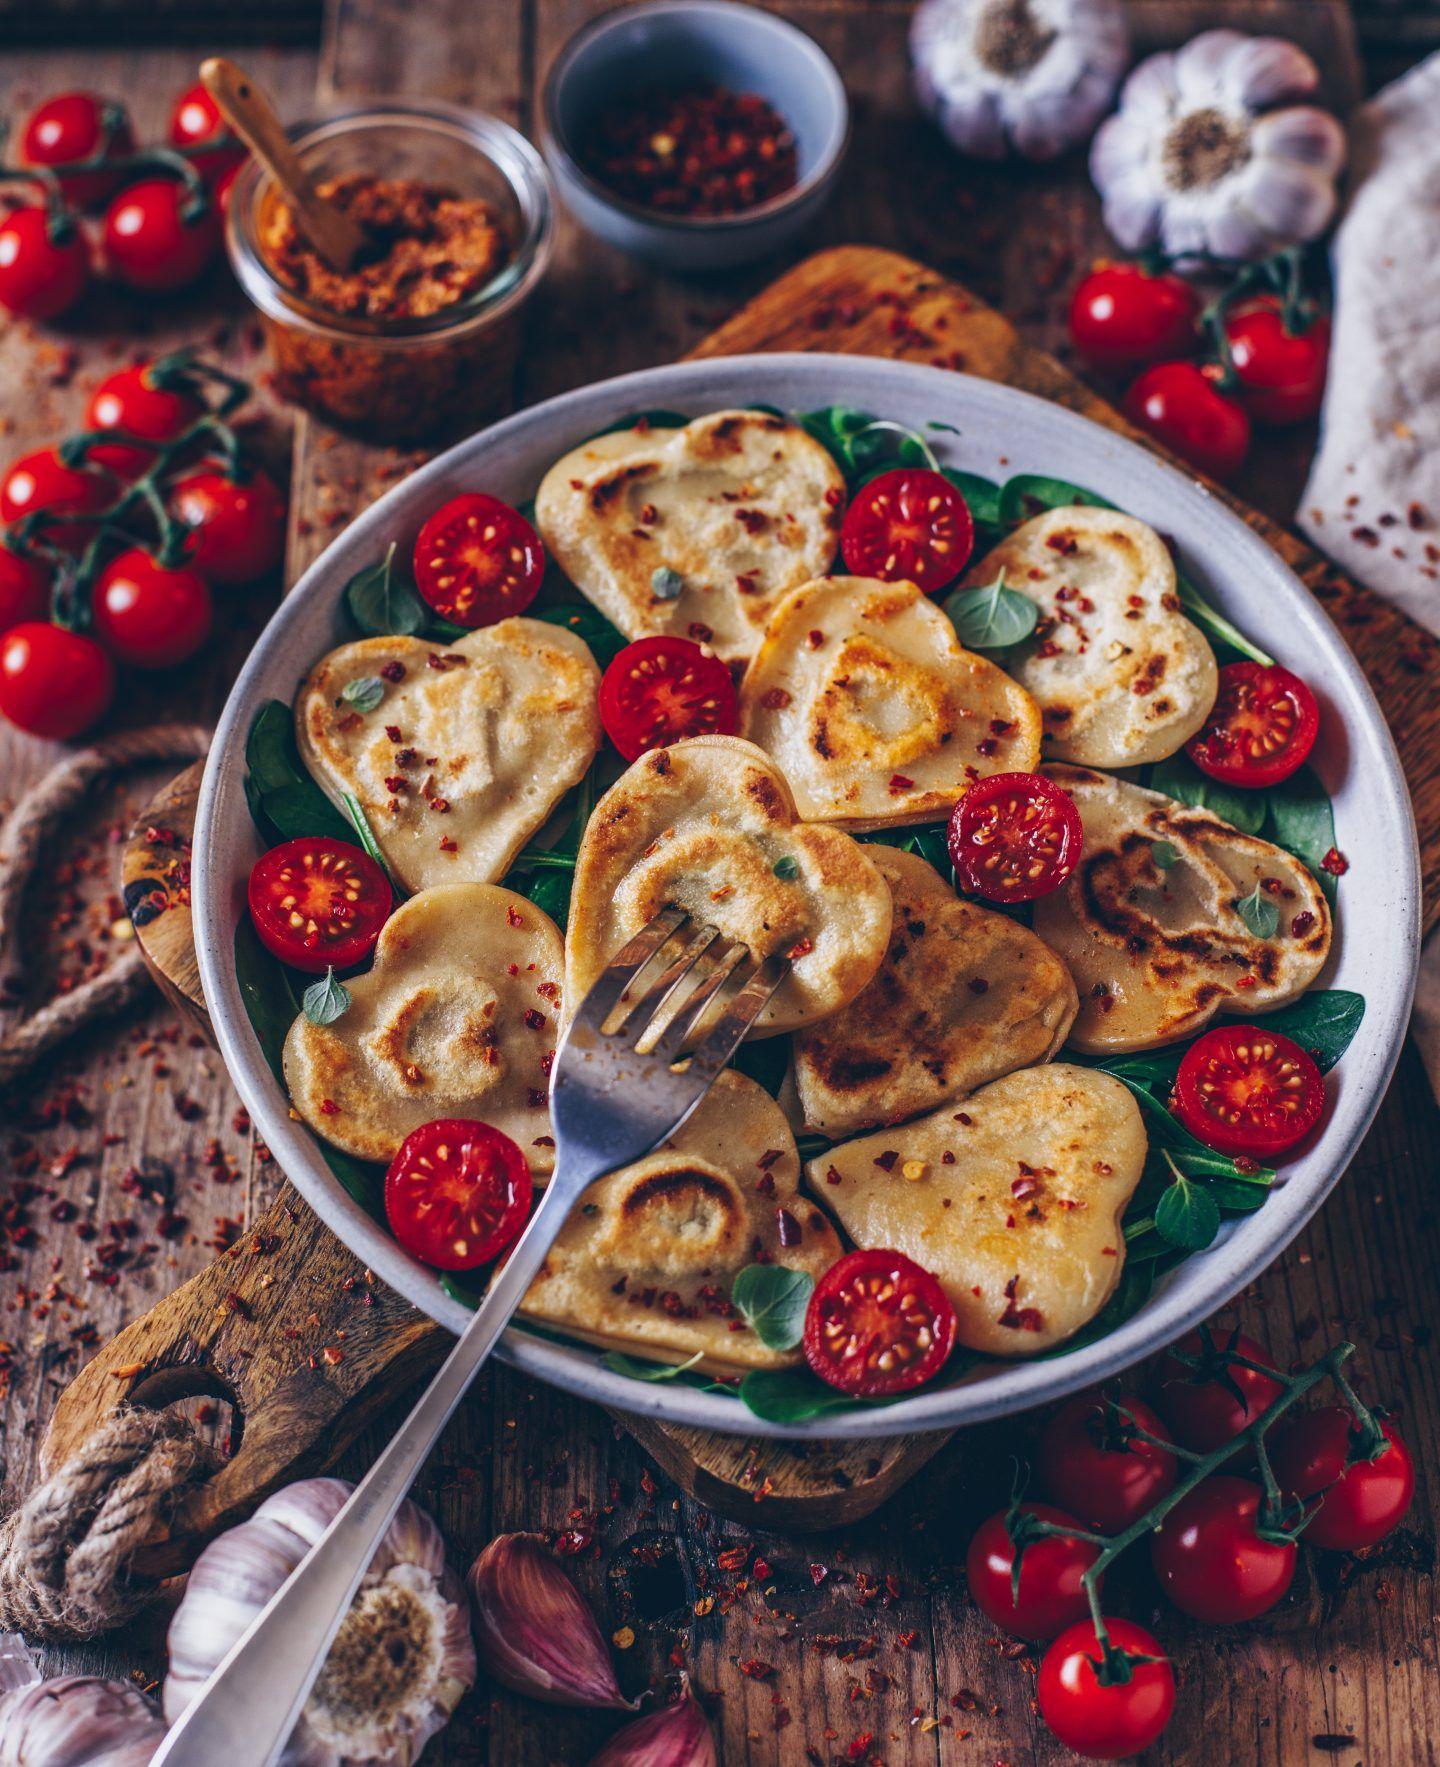 Homemade Vegan Ravioli Hearts For Valentines Day